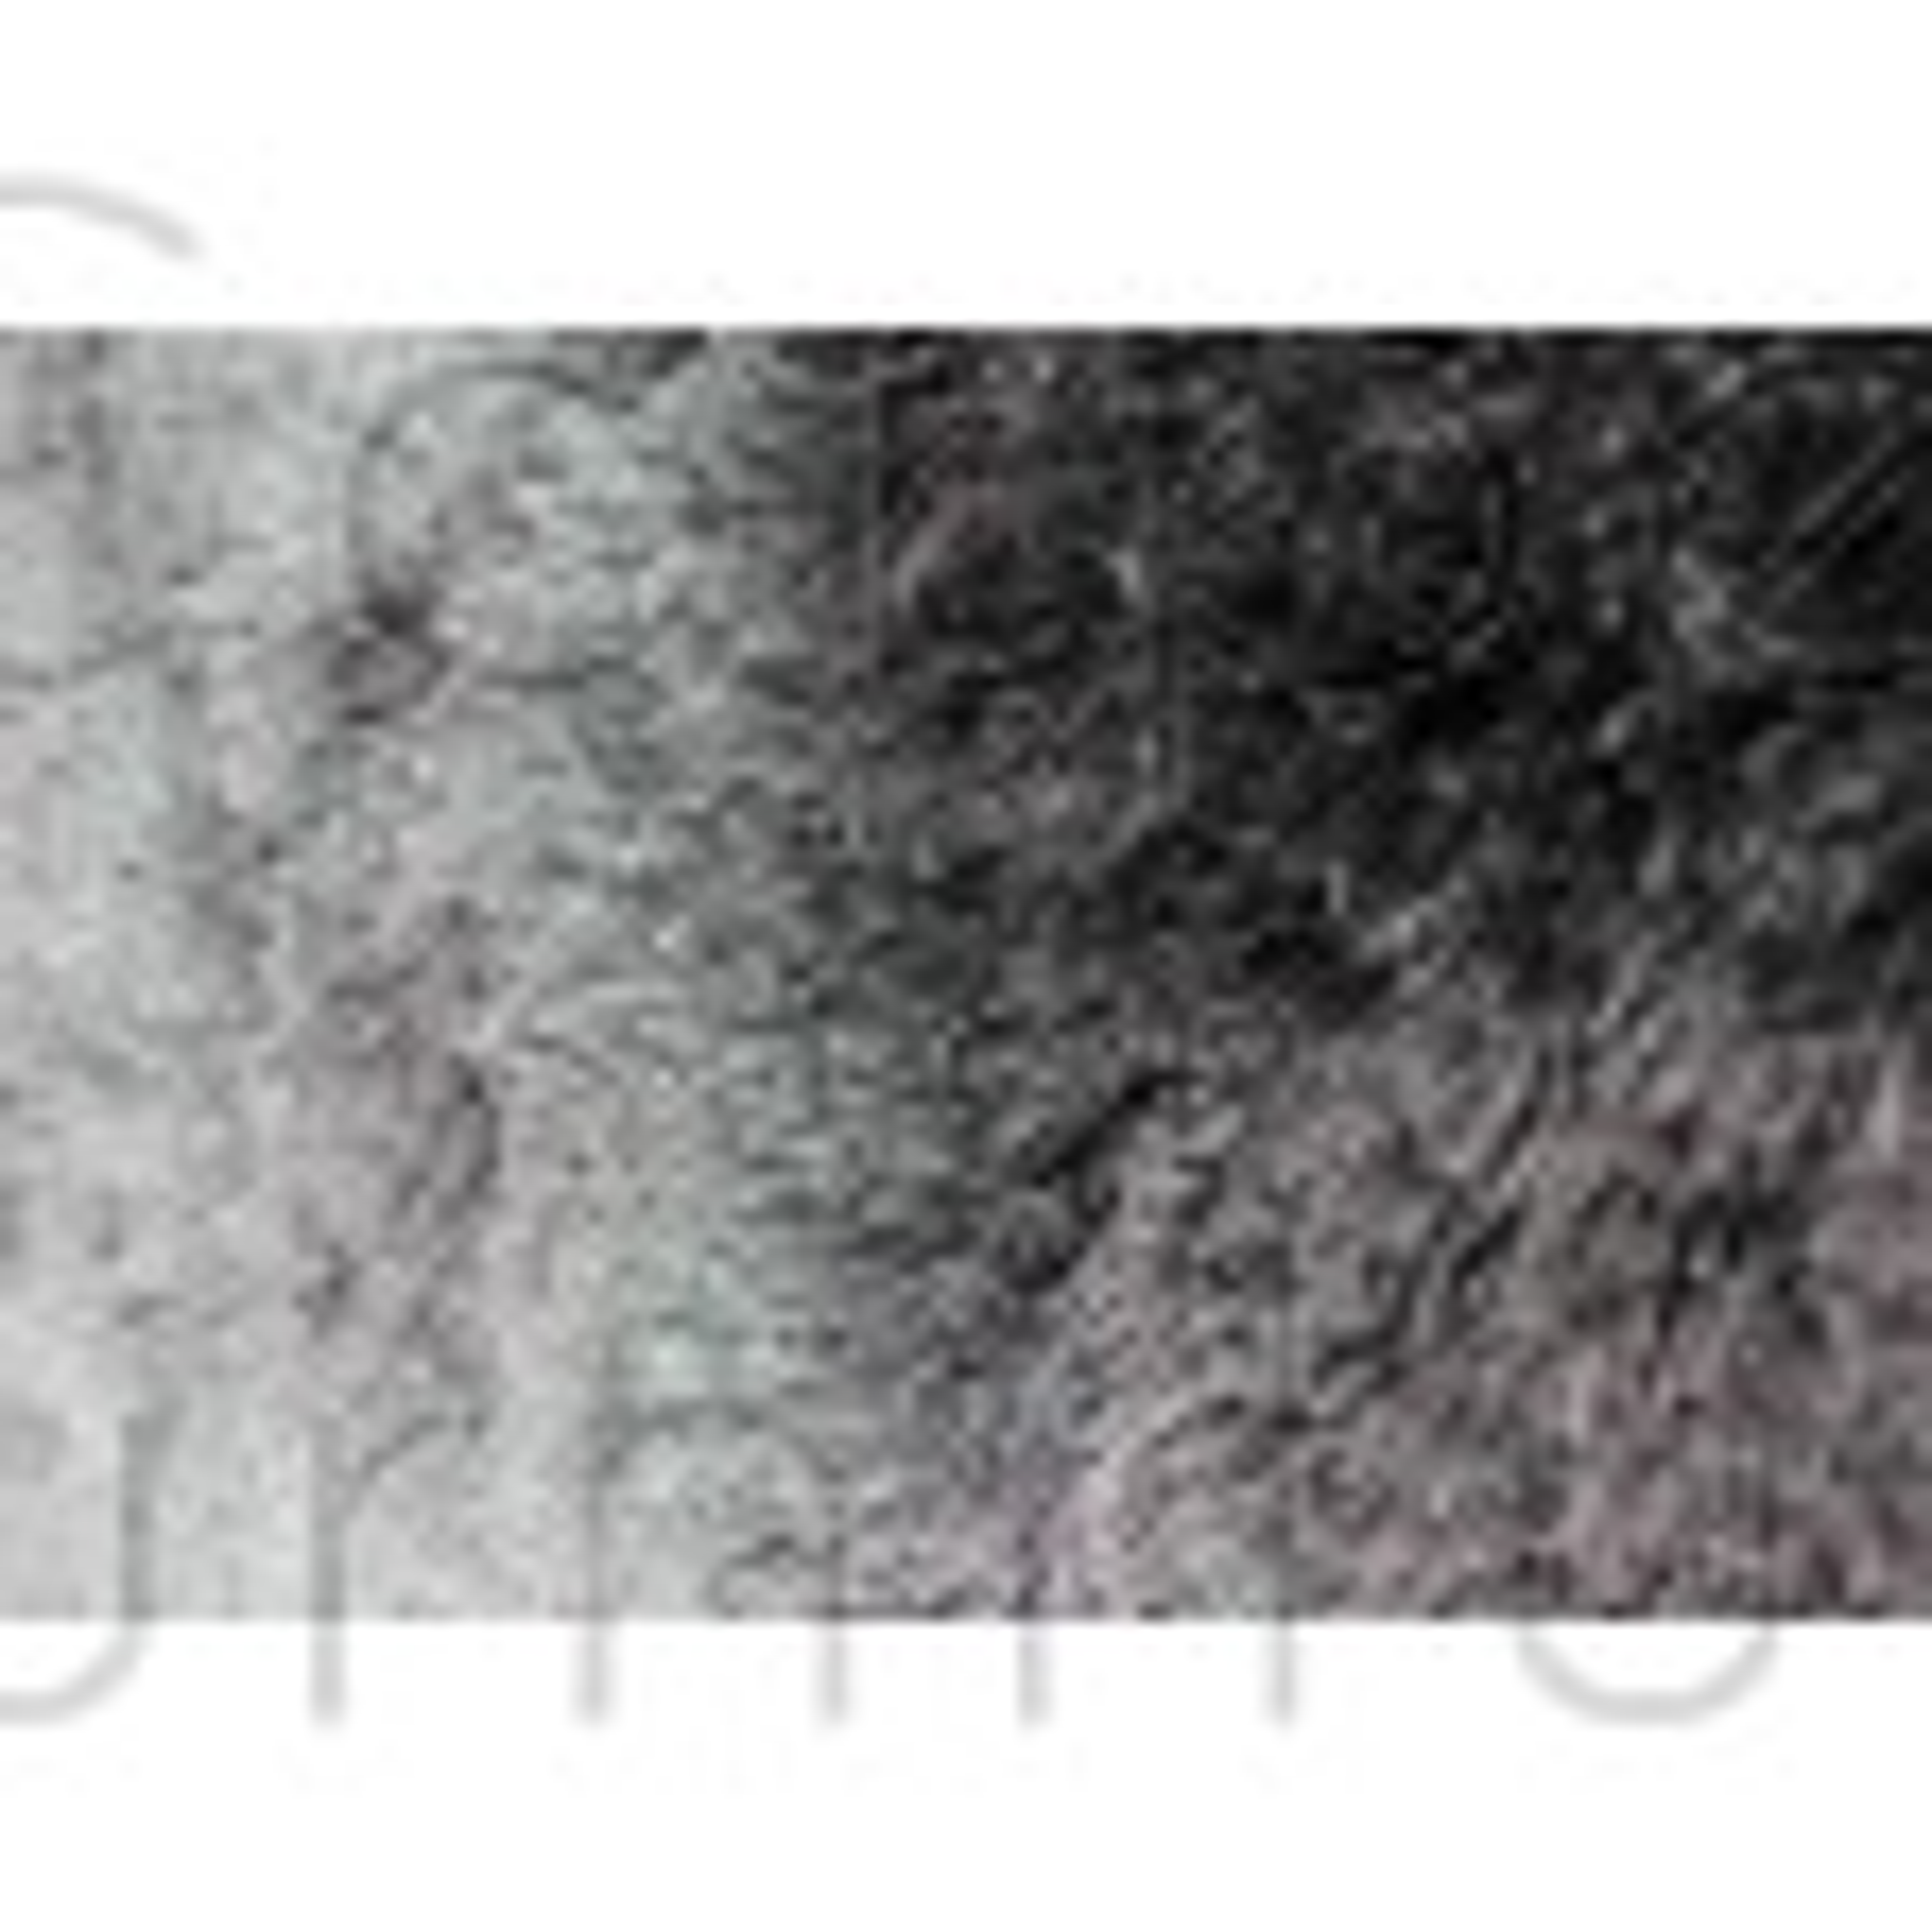 "Splendour Shadow Shaggy Rug - Charcoal - Size 60 x 110 cm (2' x 3'7"")"